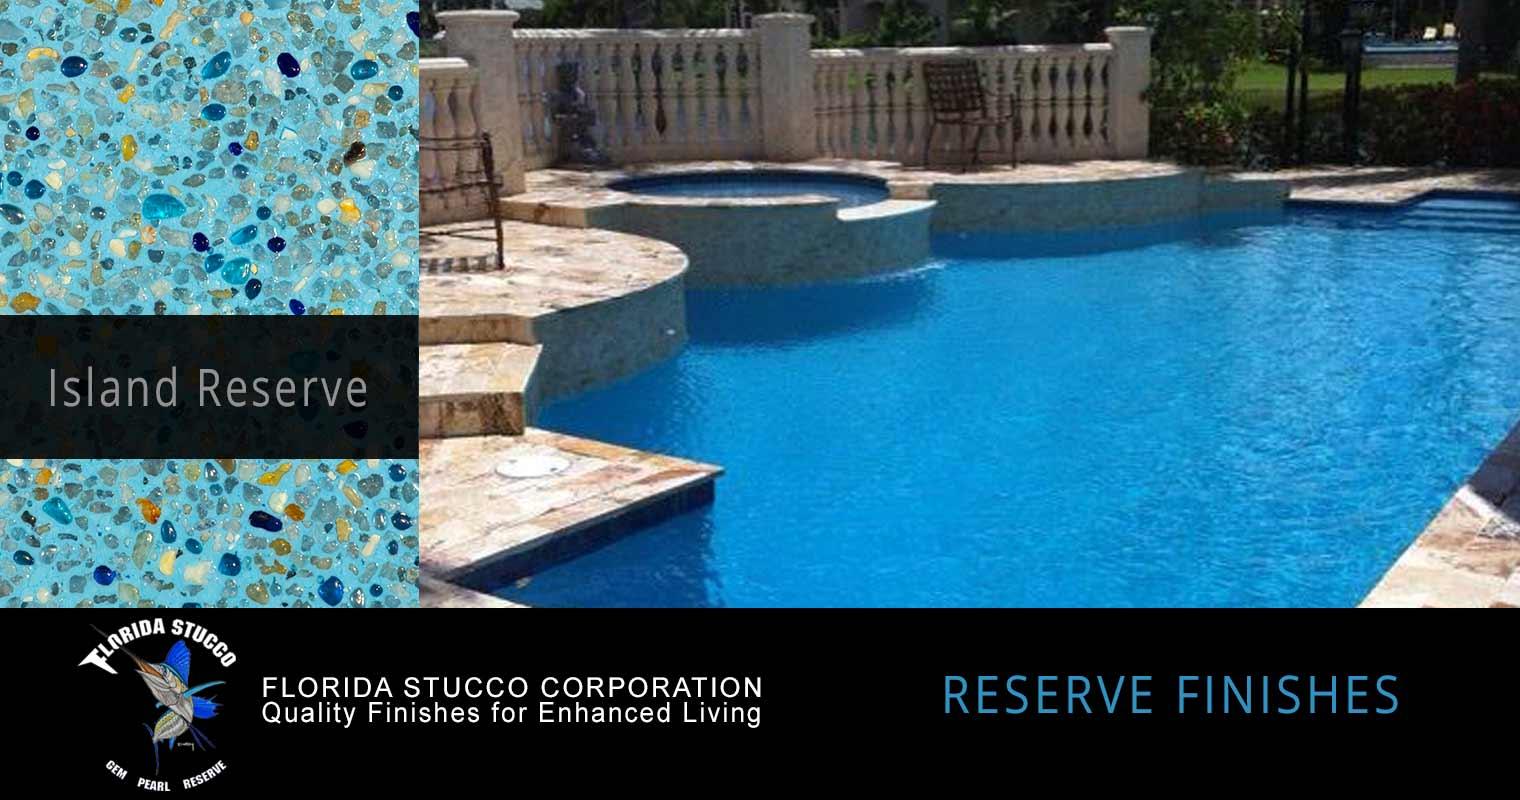 Florida Stucco - Island Reserve Gem and Glass Plastering Finish Pool Sample 1